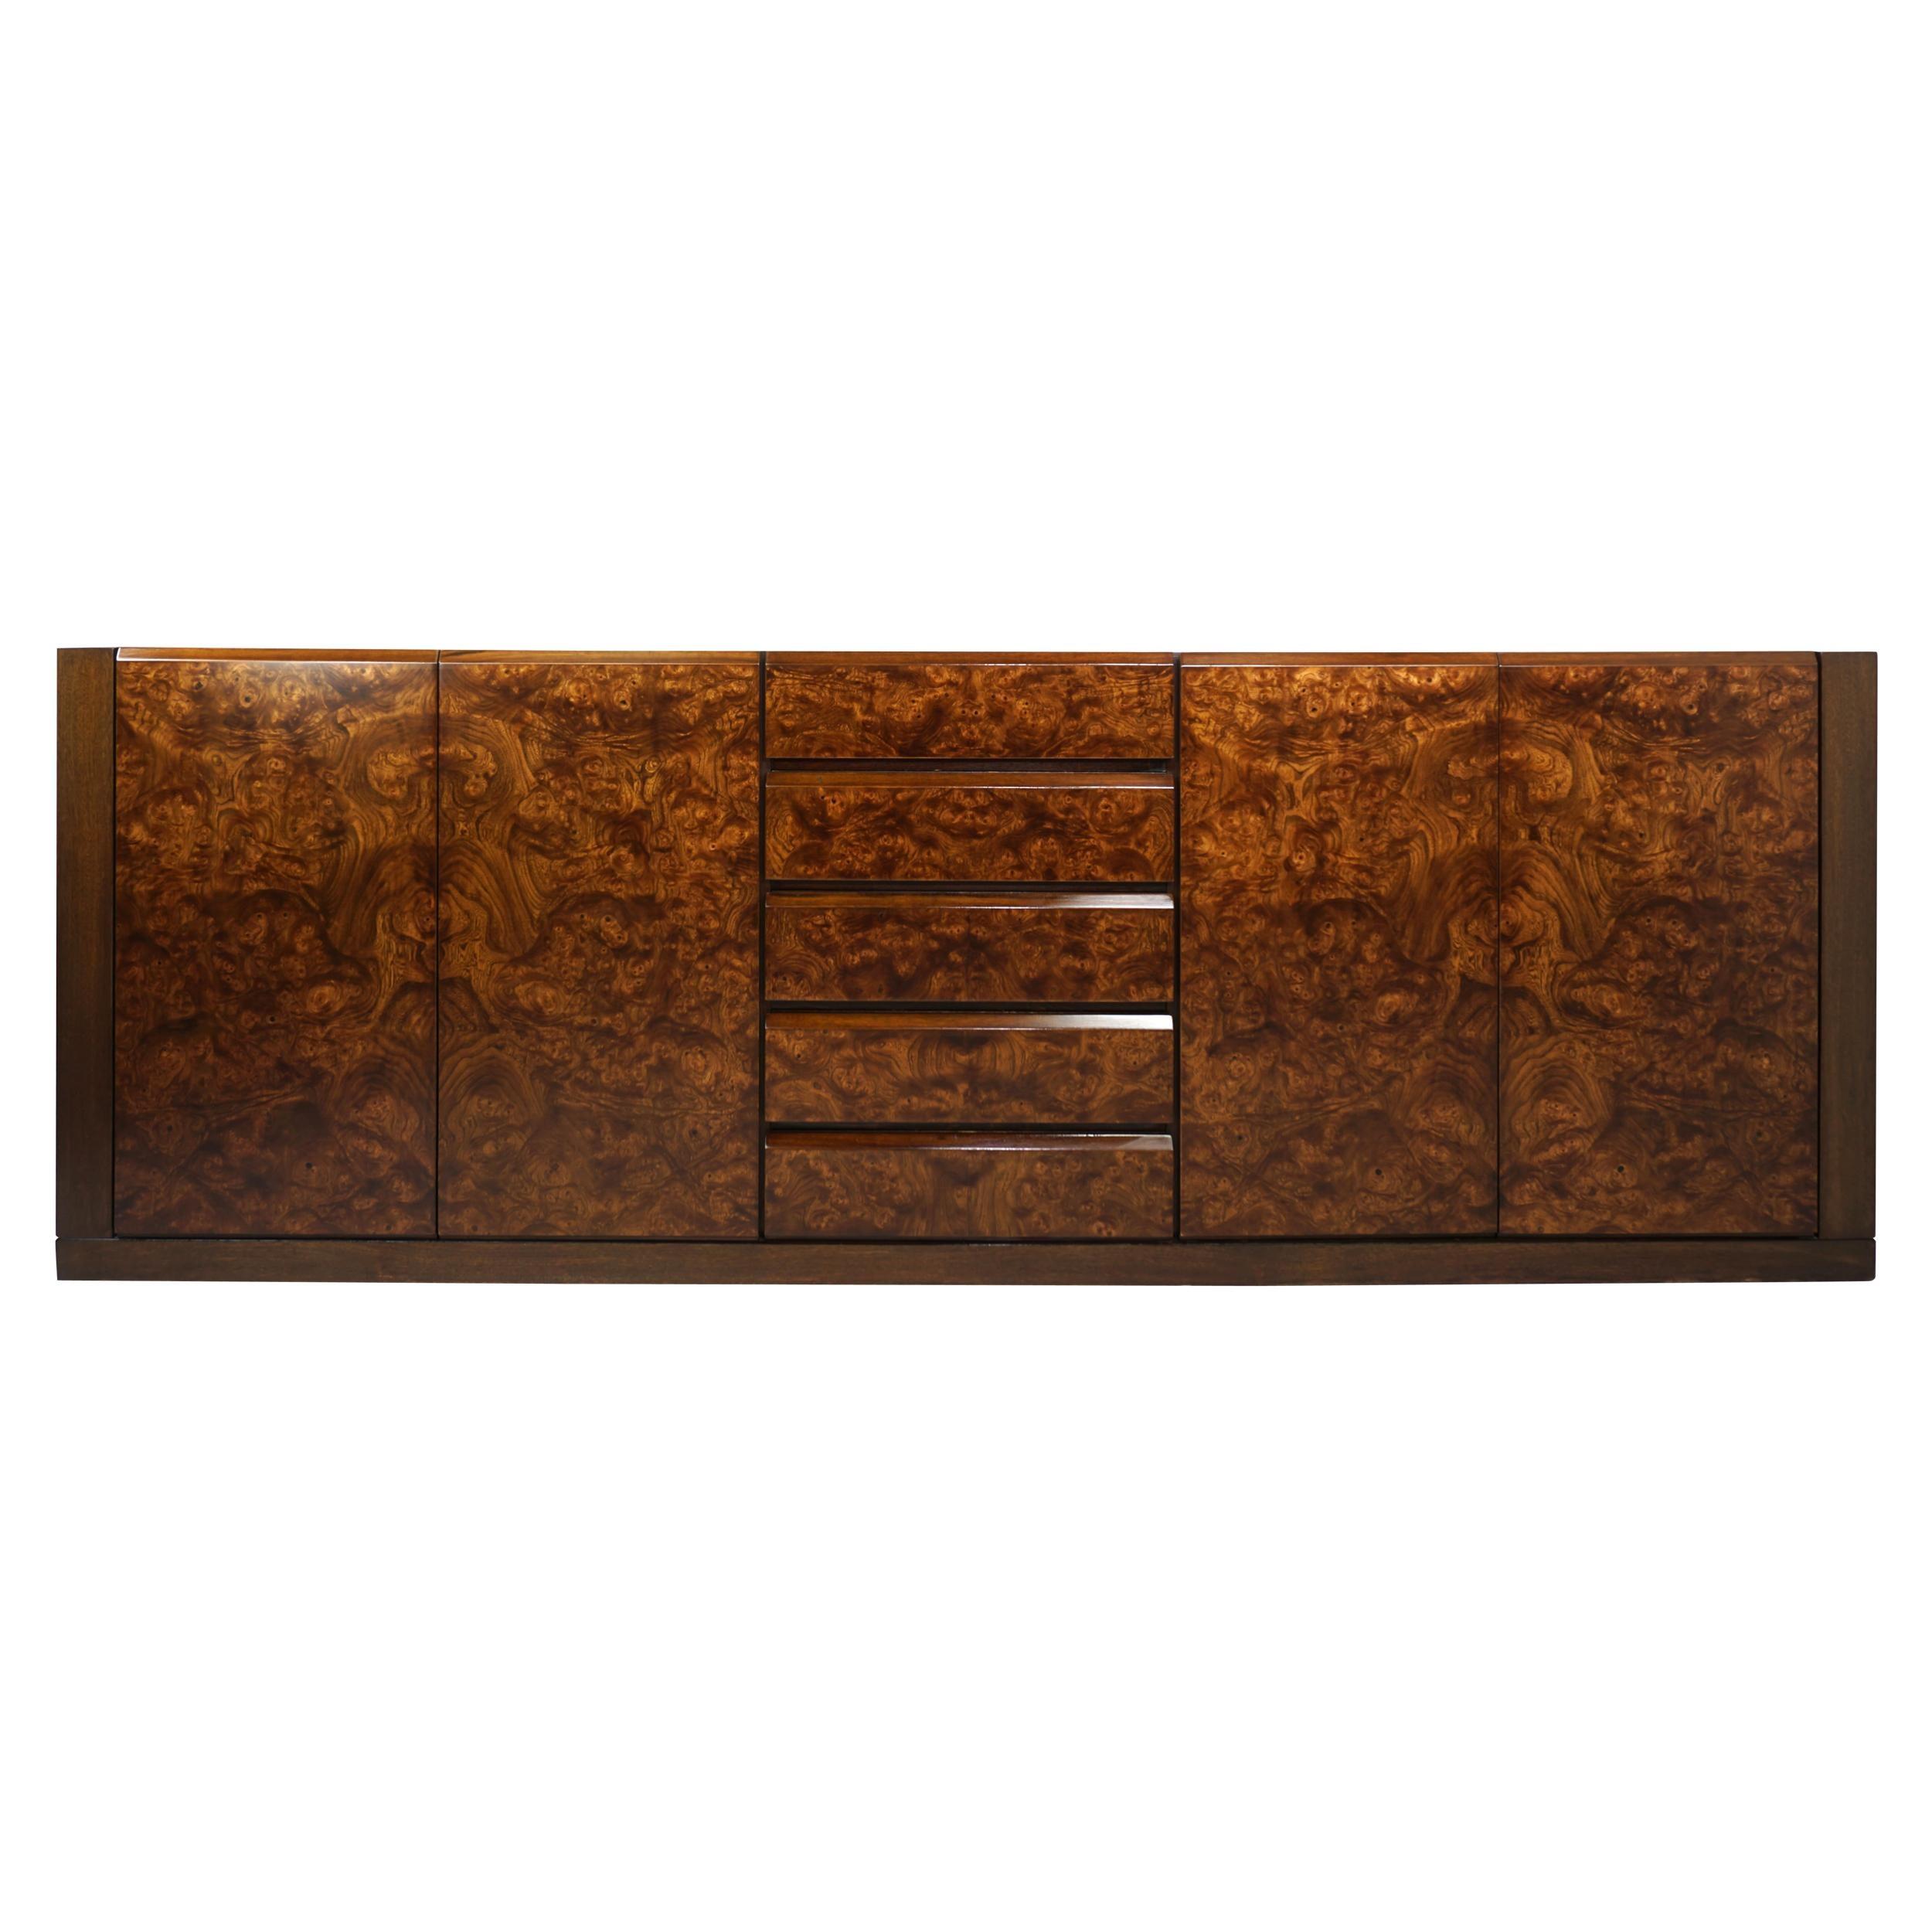 1960s - 1970s Design Burl Walnut Wooden Important Sideboard